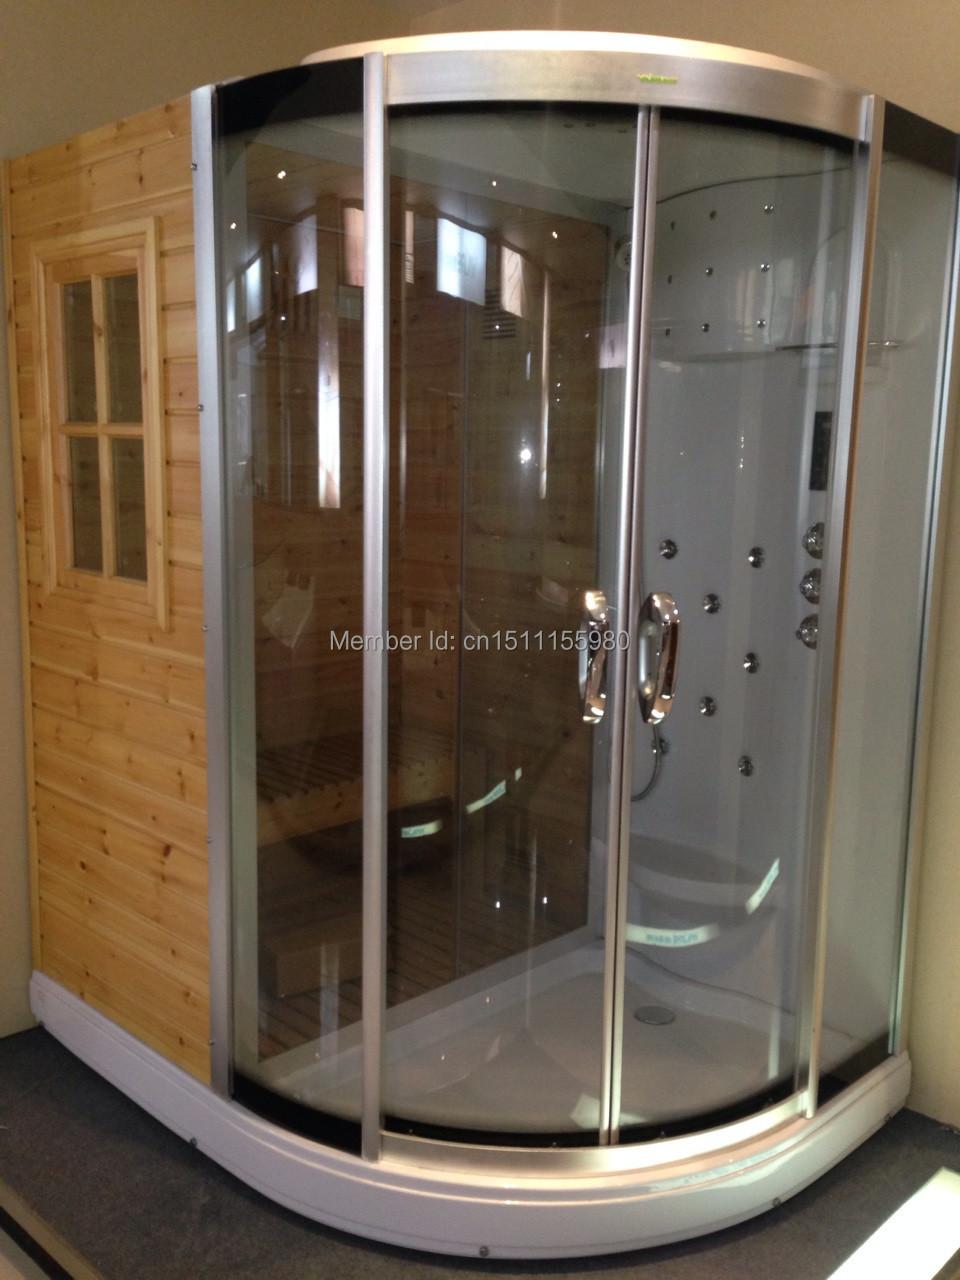 Luxury Home Sauna Cedardirect Com: Luxury Steam Sauna Room SA022-in Sauna Rooms From Home